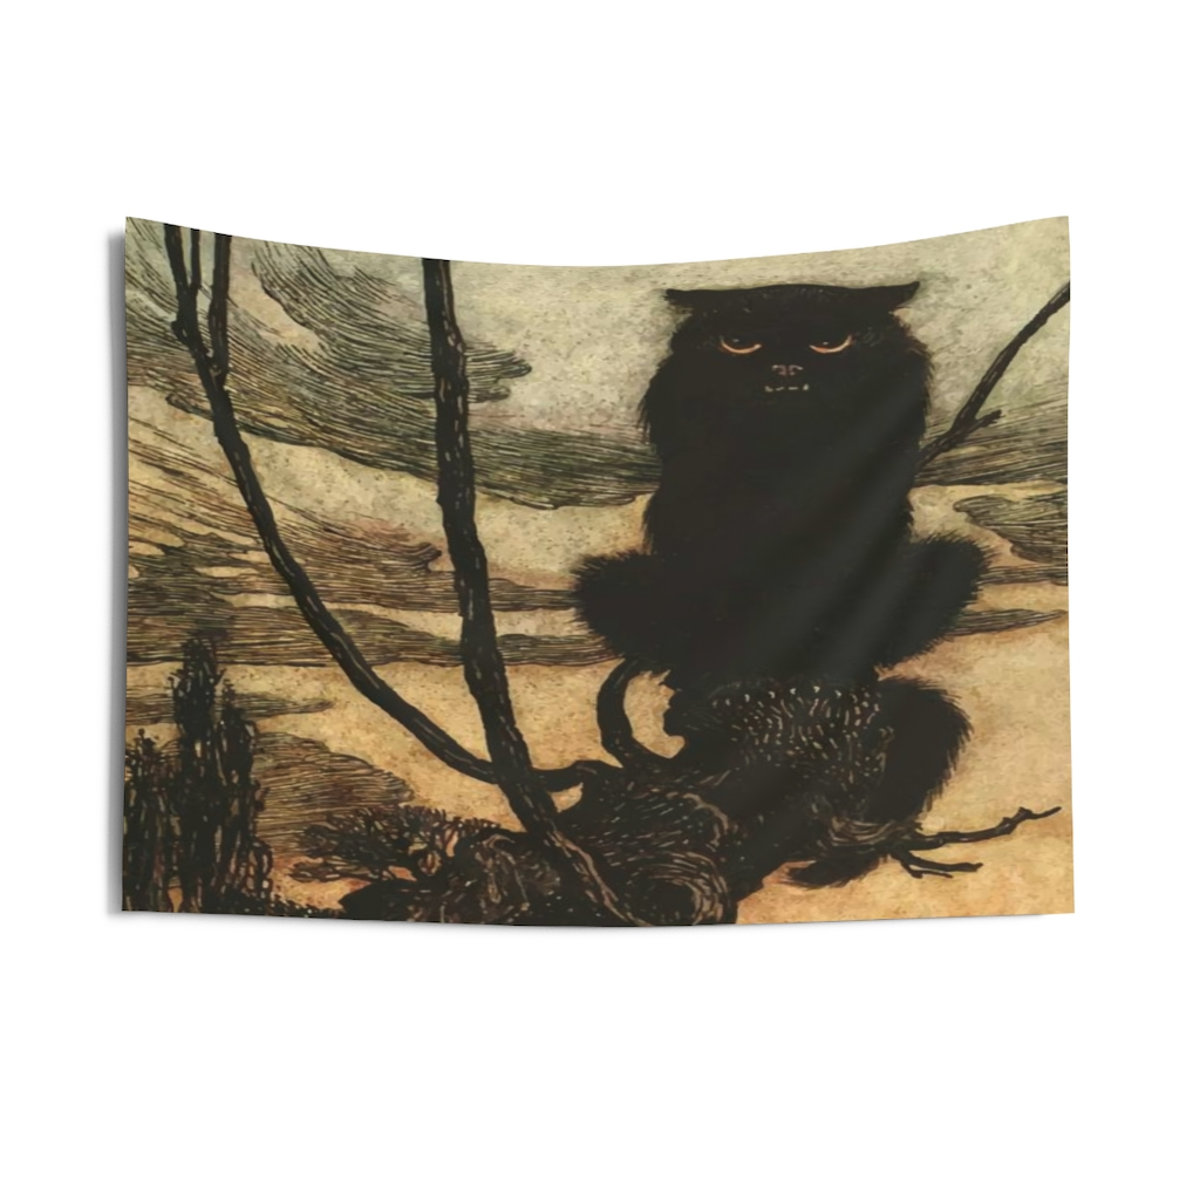 Arthur Rackham Halloween Indoor Wall Tapestry Black Cat 1920